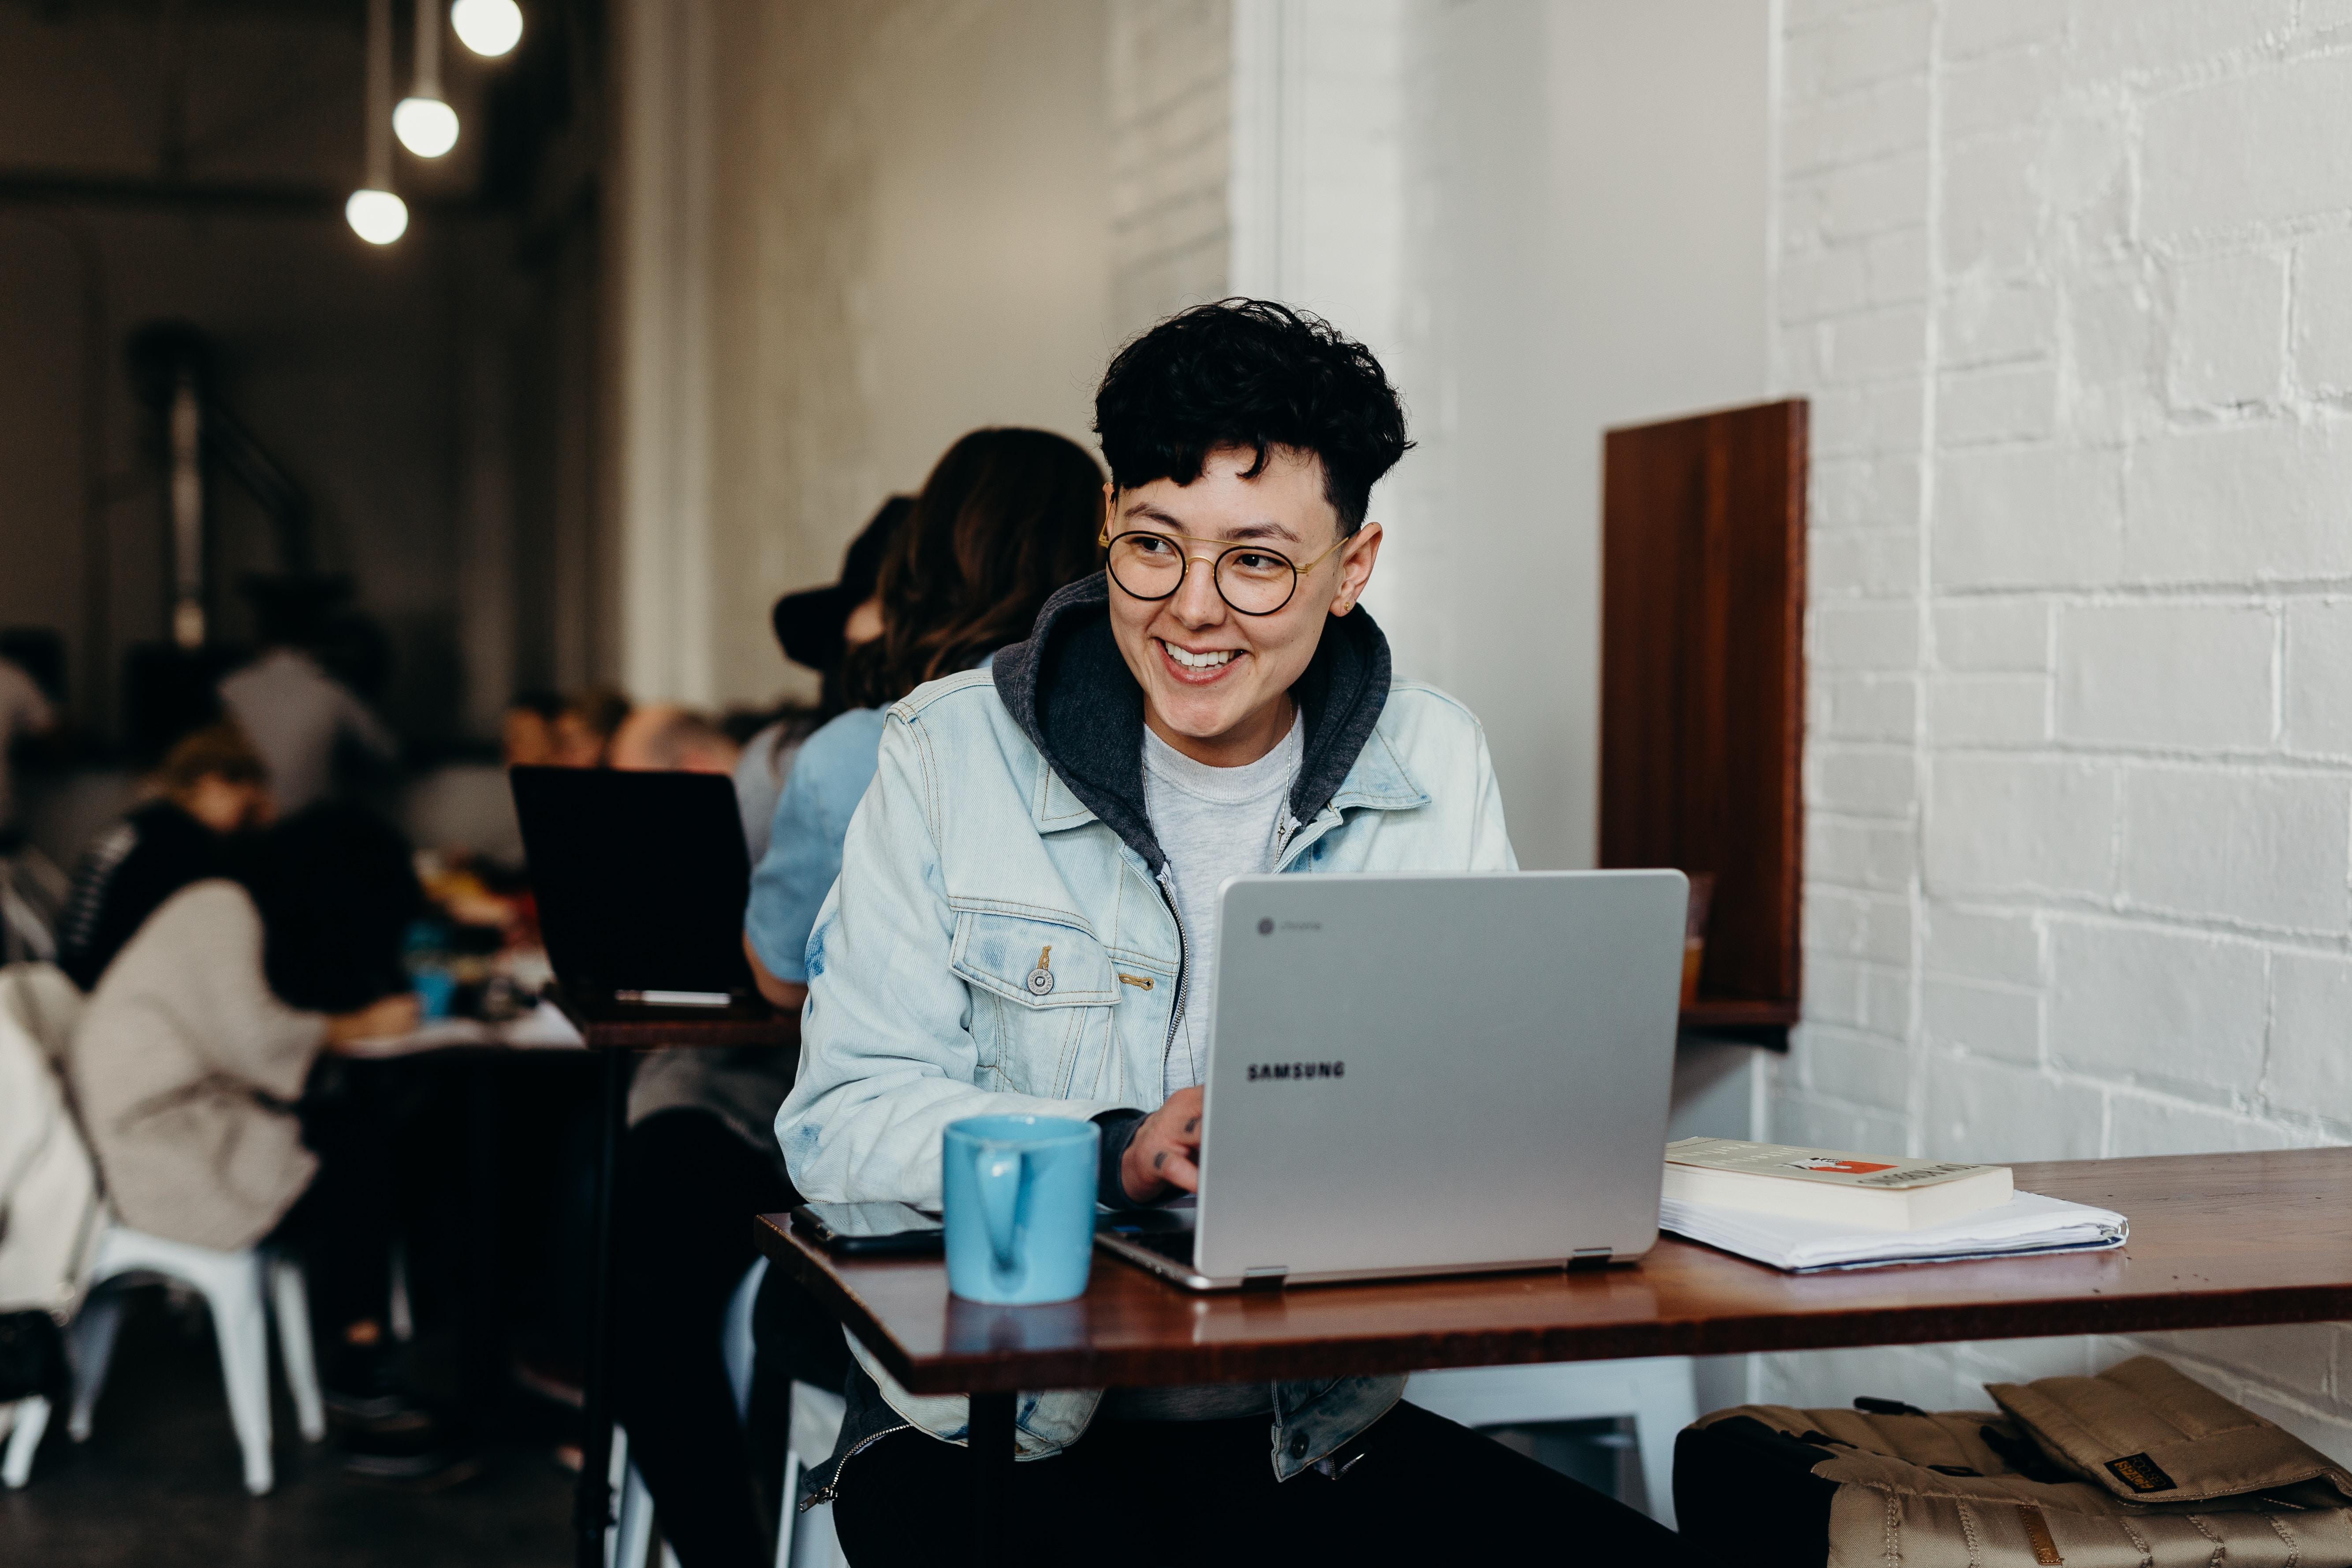 smiling man sitting and using Samsung laptop near people